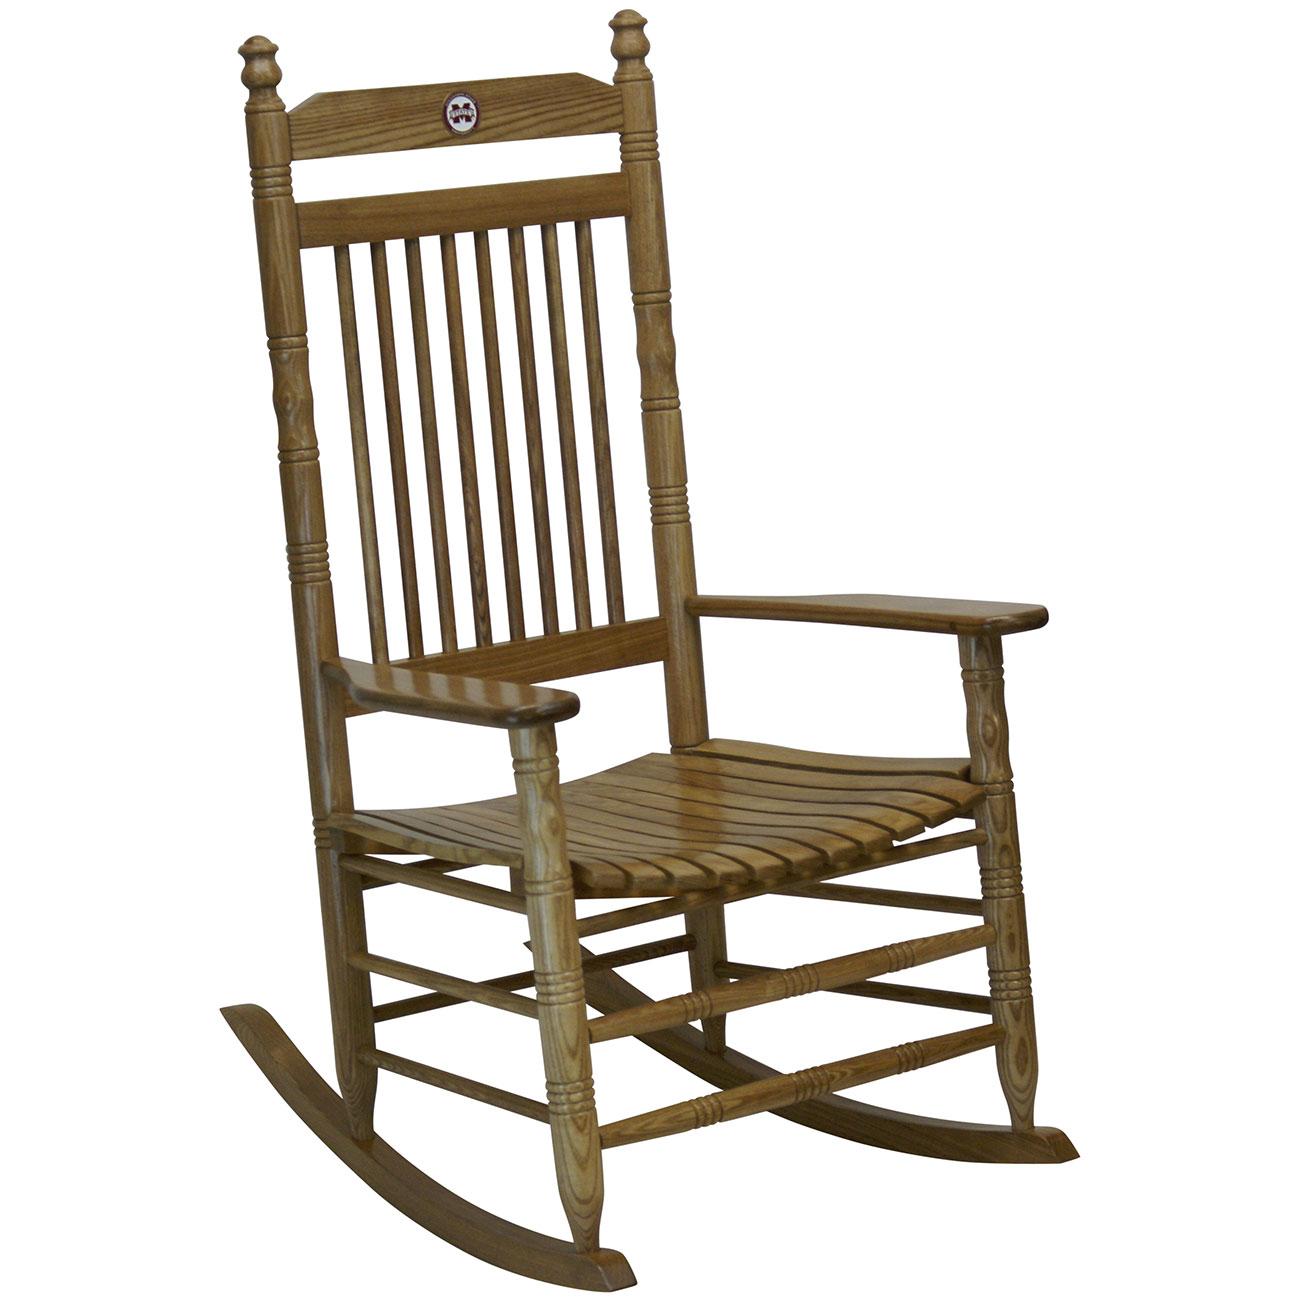 Shop.crackerbarrel.com: Hardwood Rocking Chair   Mississippi State    Cracker Barrel Old Country Store